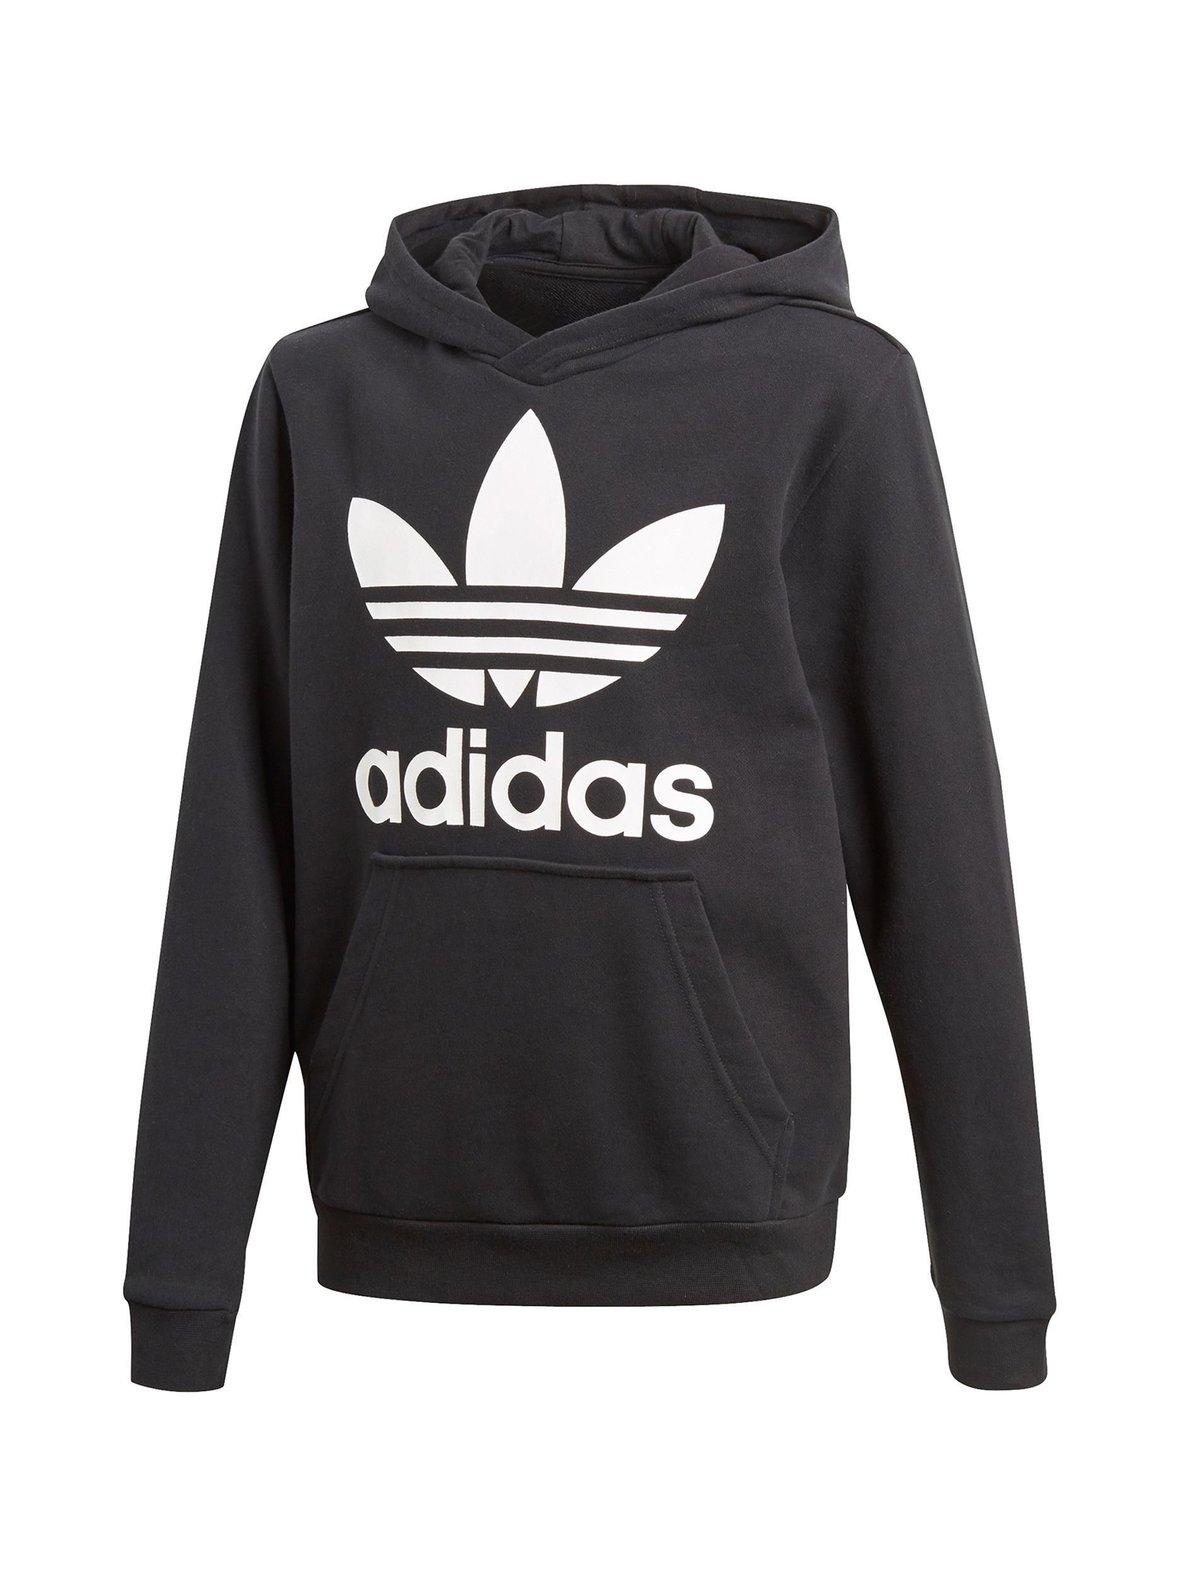 Musta Adidas Originals Trefoil-huppari CD6499  4e5df41737